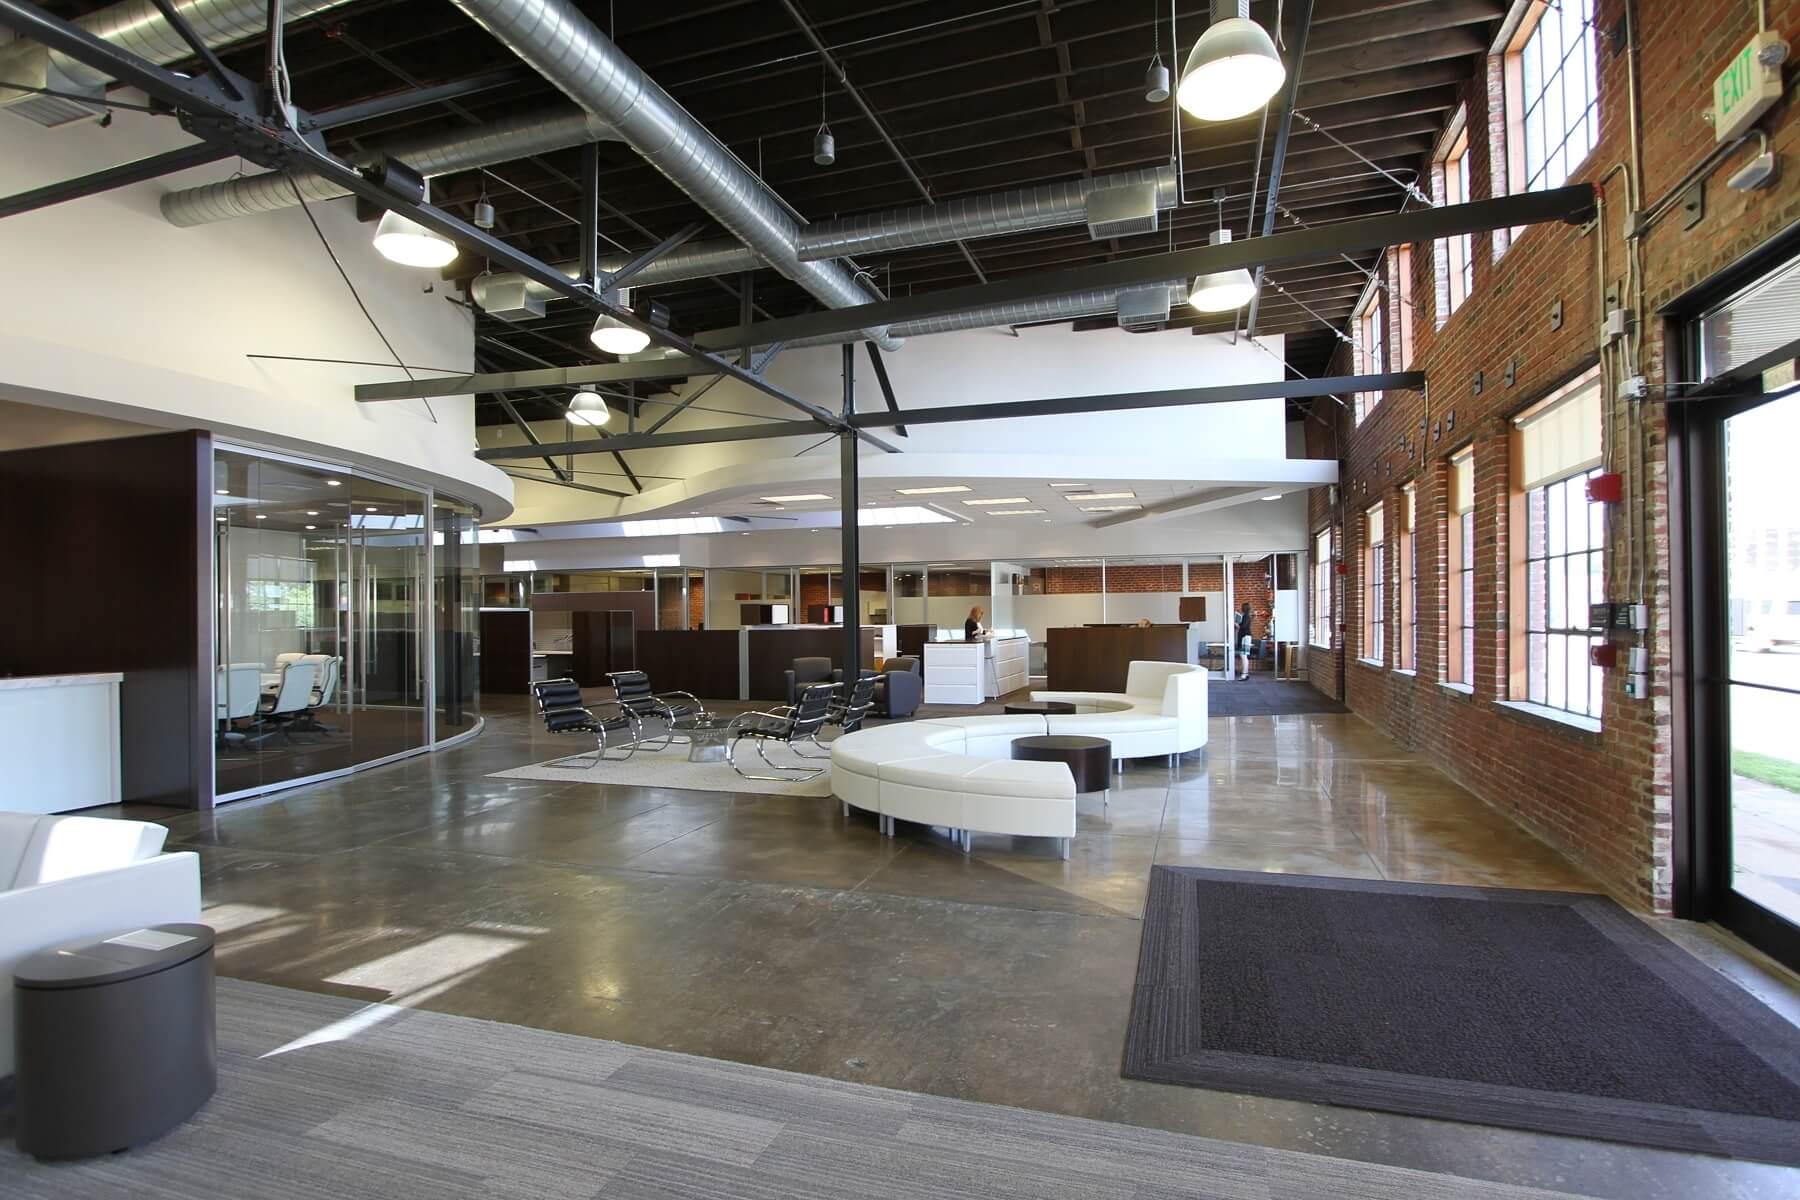 ... Memphis Scan Interiors Tn Home Design Ideas And Pictures Scan Interiors  Memphis Tennessee Scan Interiors Memphis The Best Interior Designers In  Memphis